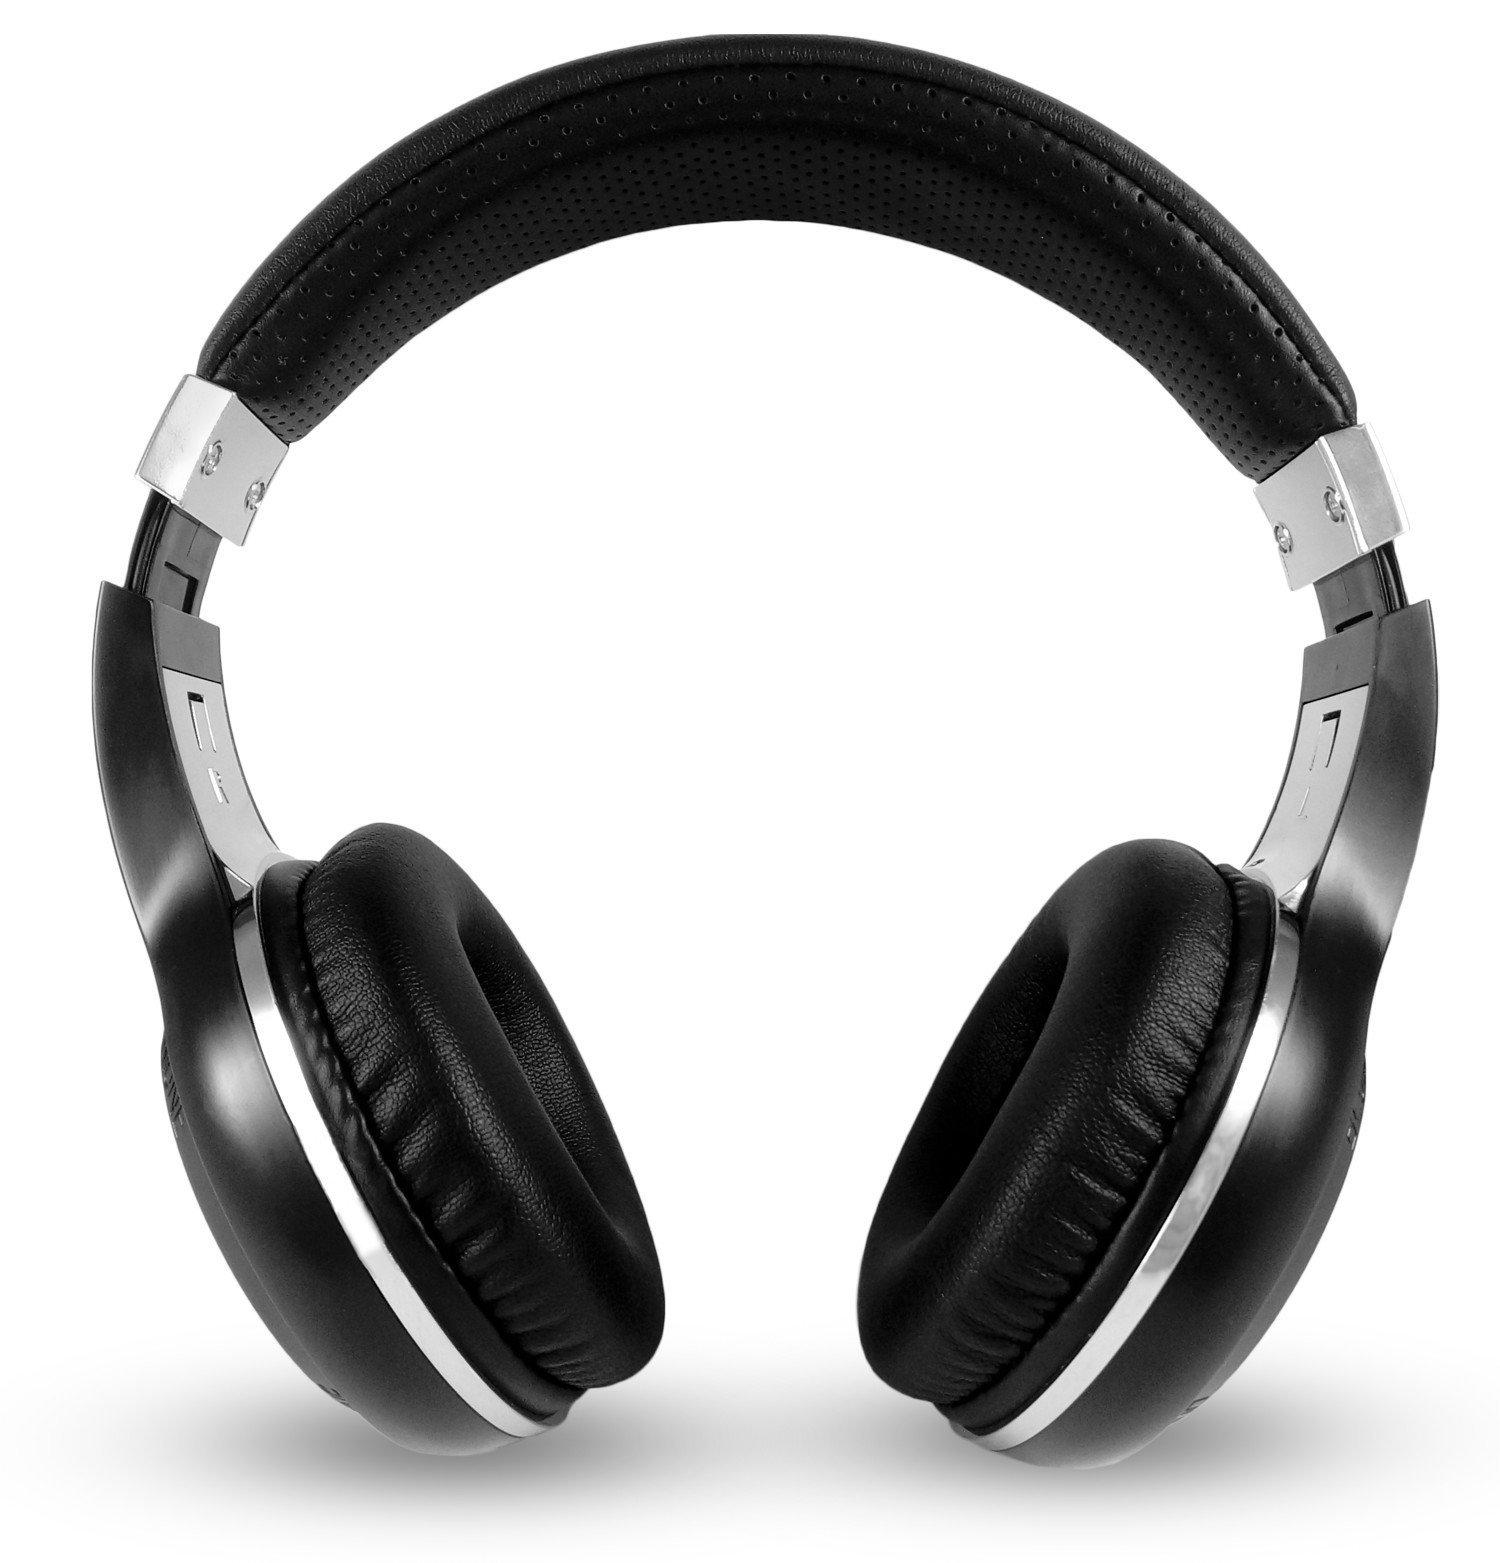 Słuchawki BT 4 1 A2DP do Sony Xperia C5 Ultra Dual